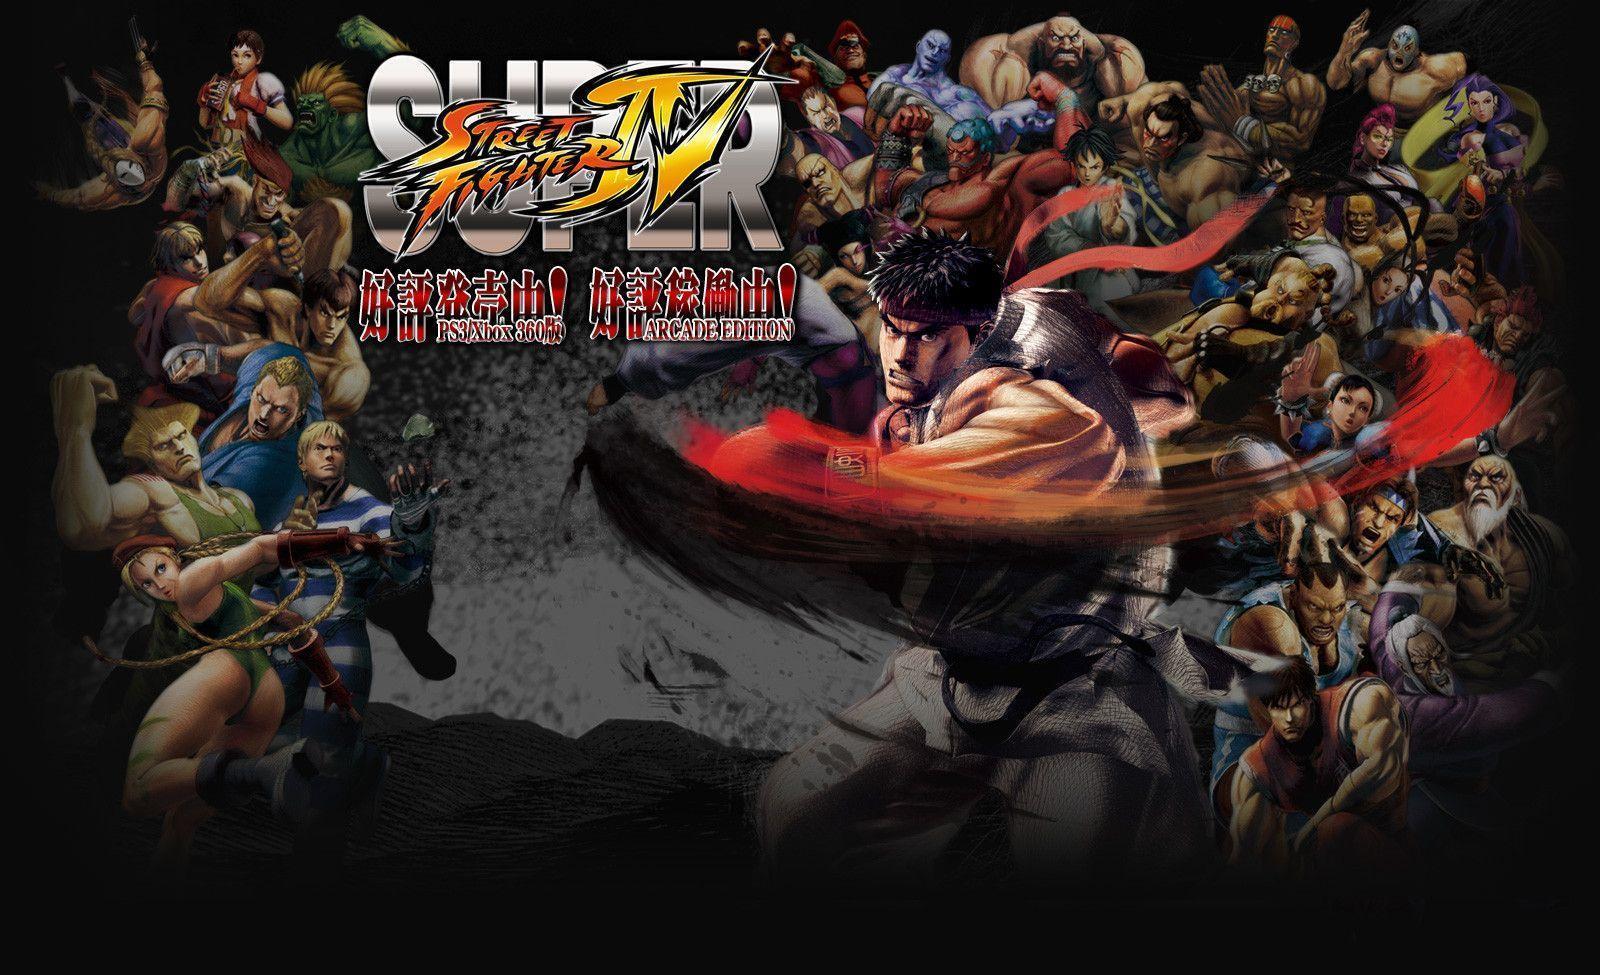 Super Street Fighter 4 Wallpapers  Wallpaper Cave